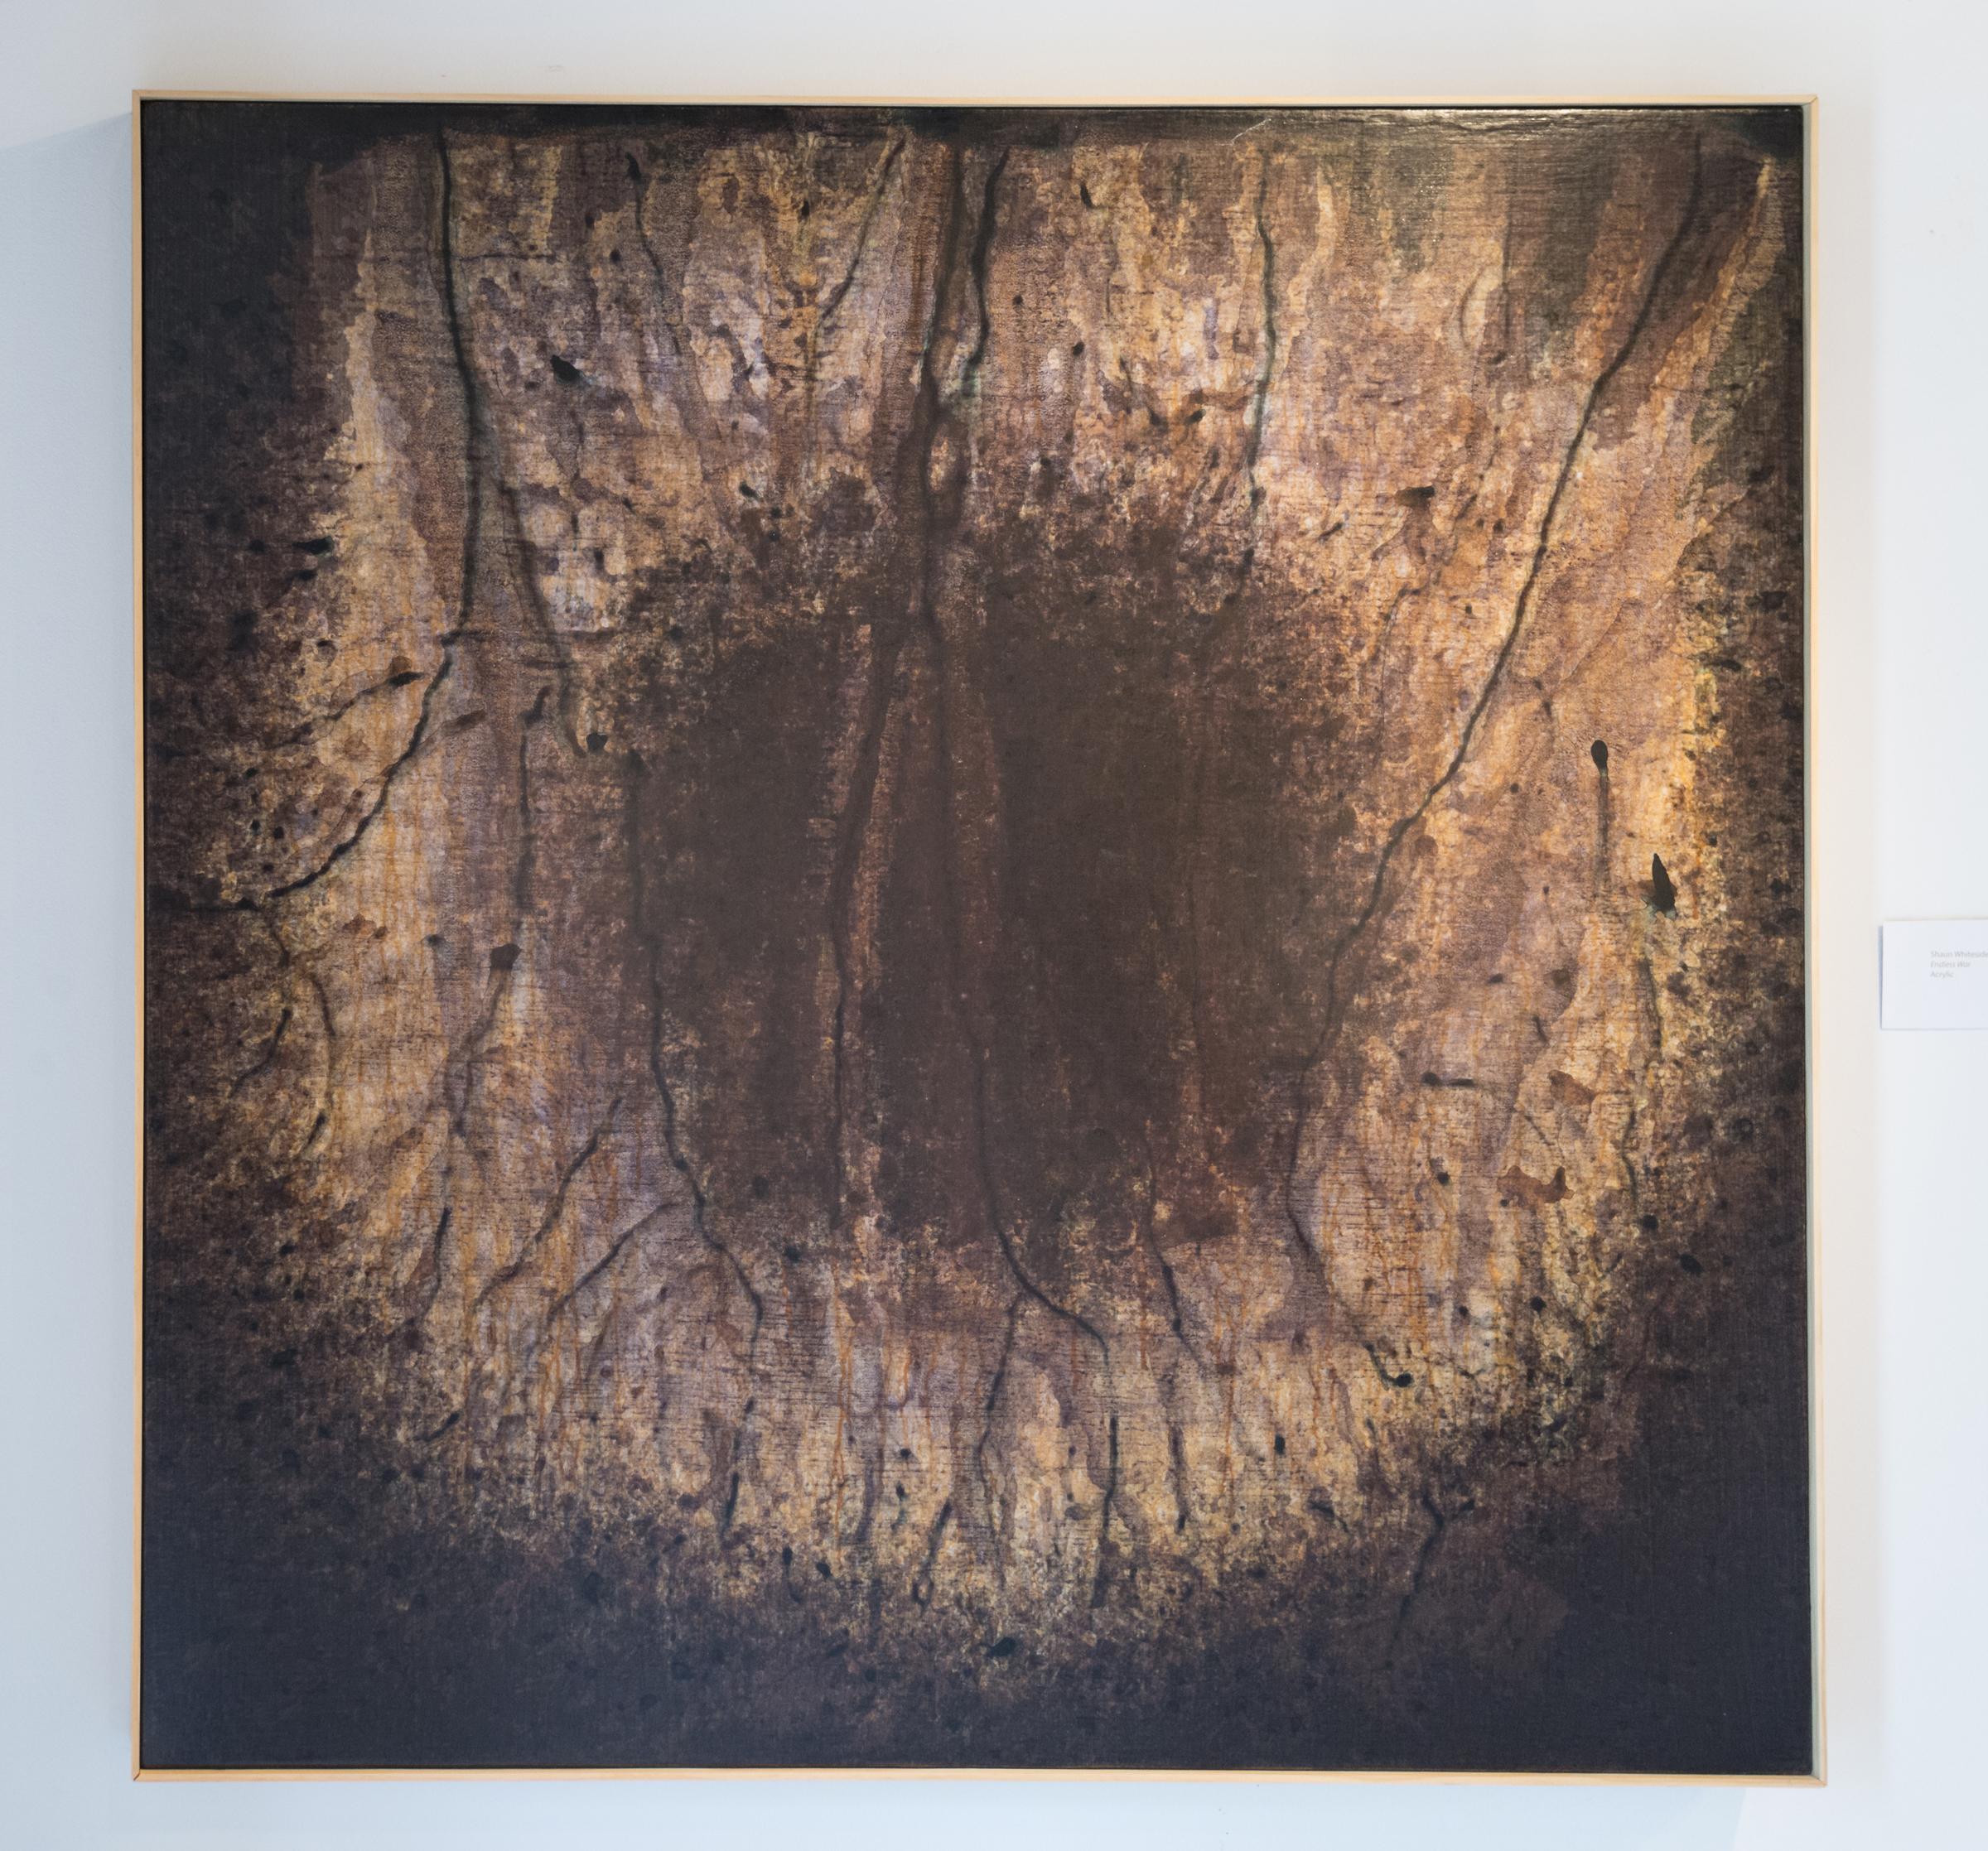 Shaun C. Whiteside,  Endless War , Acrylic on Canvas